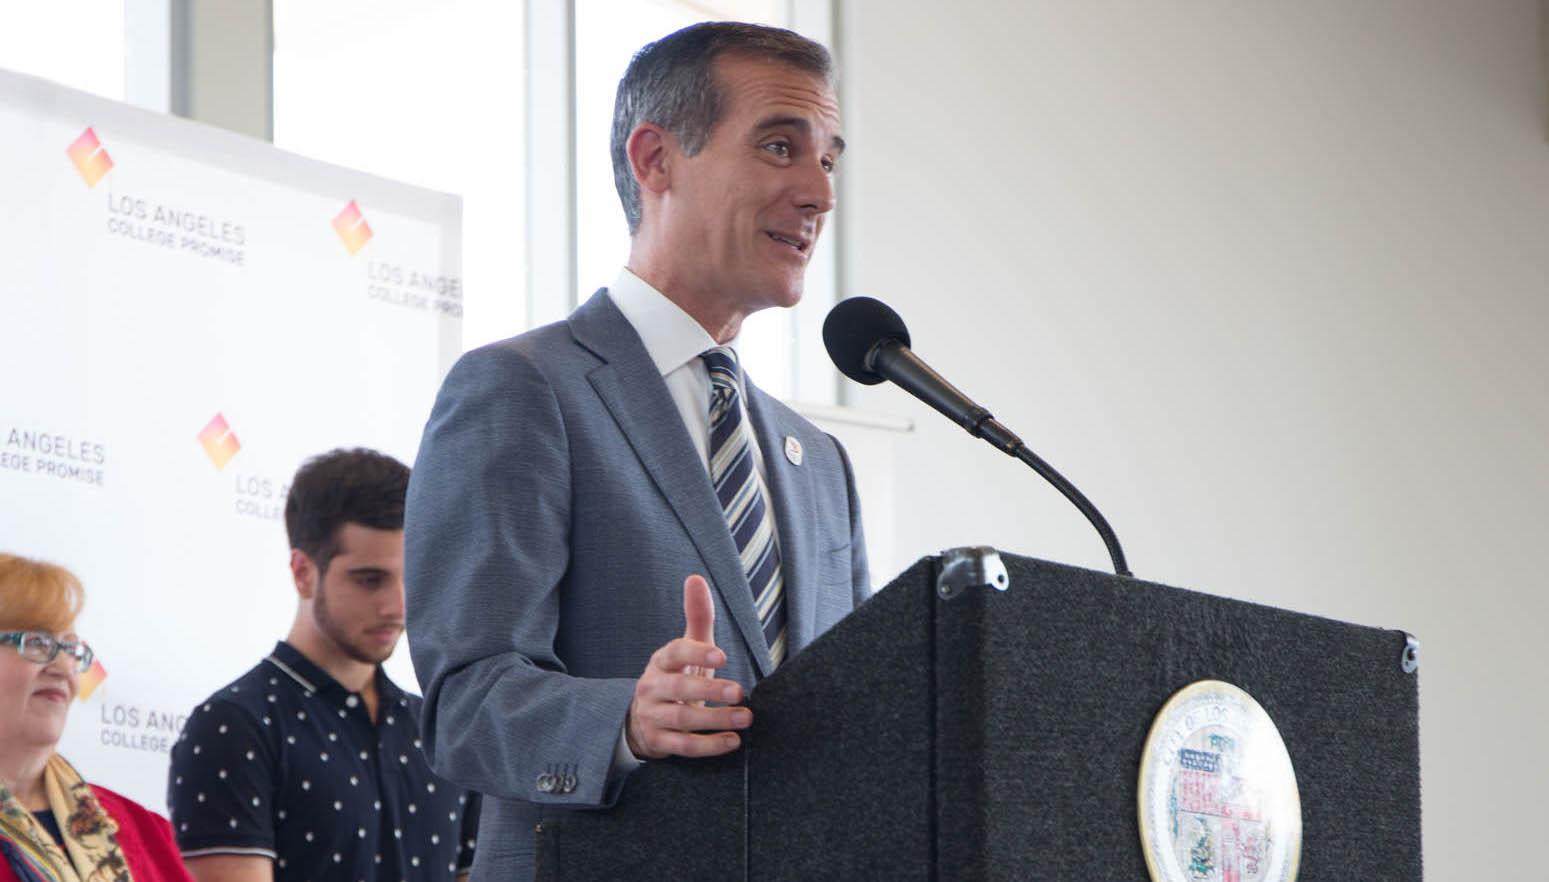 Mayor Garcetti addresses Promise students